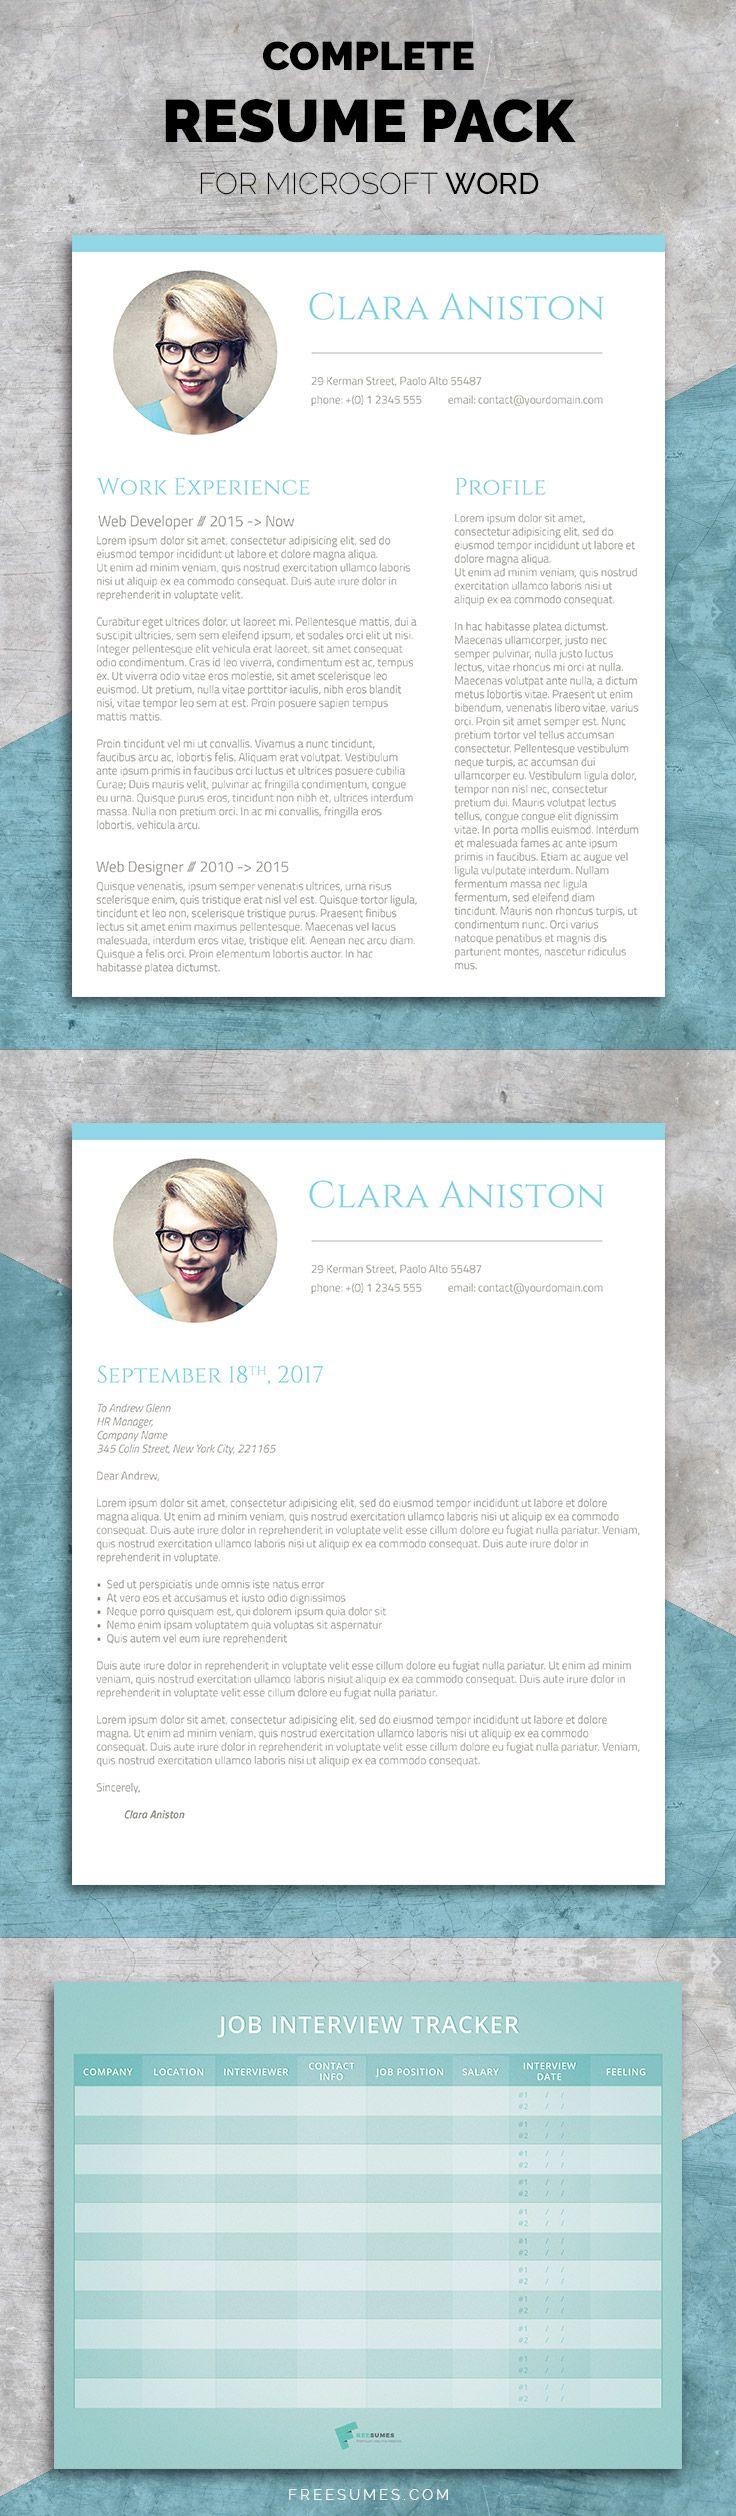 25 unique cover letter format ideas on pinterest resume cover